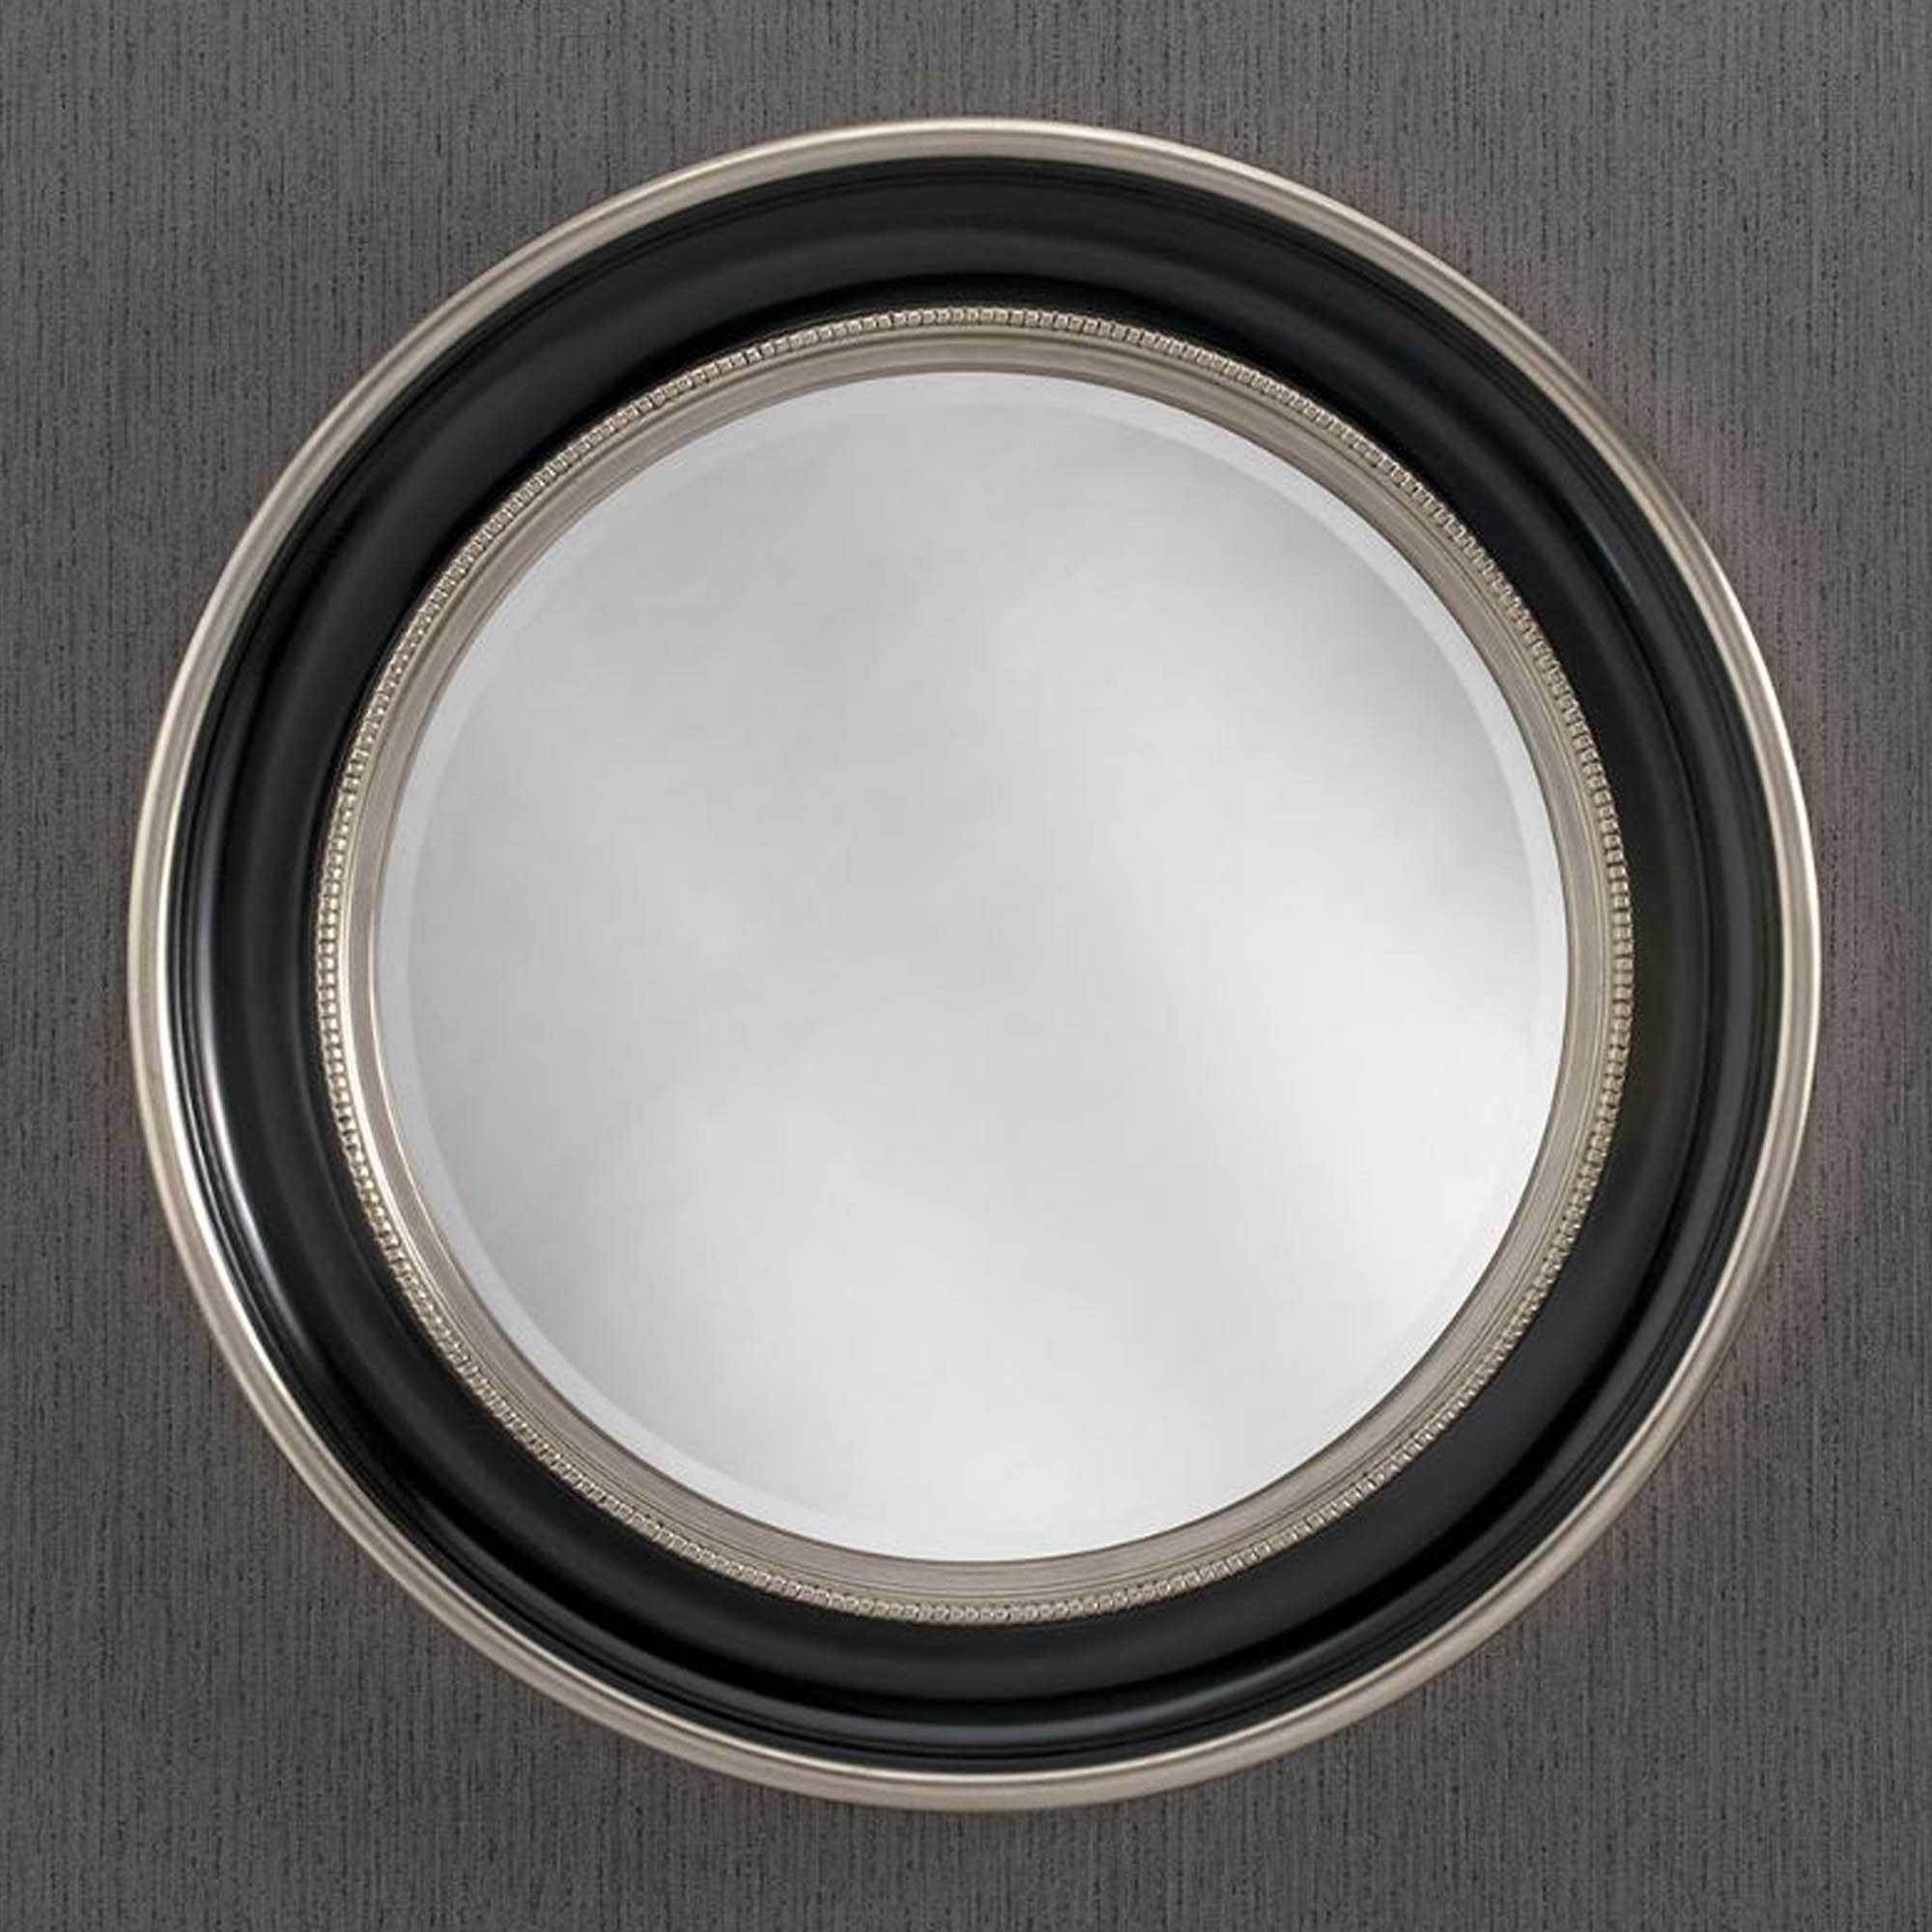 Round Black & Silver Contemporary Wall Mirror   HomesDirect365